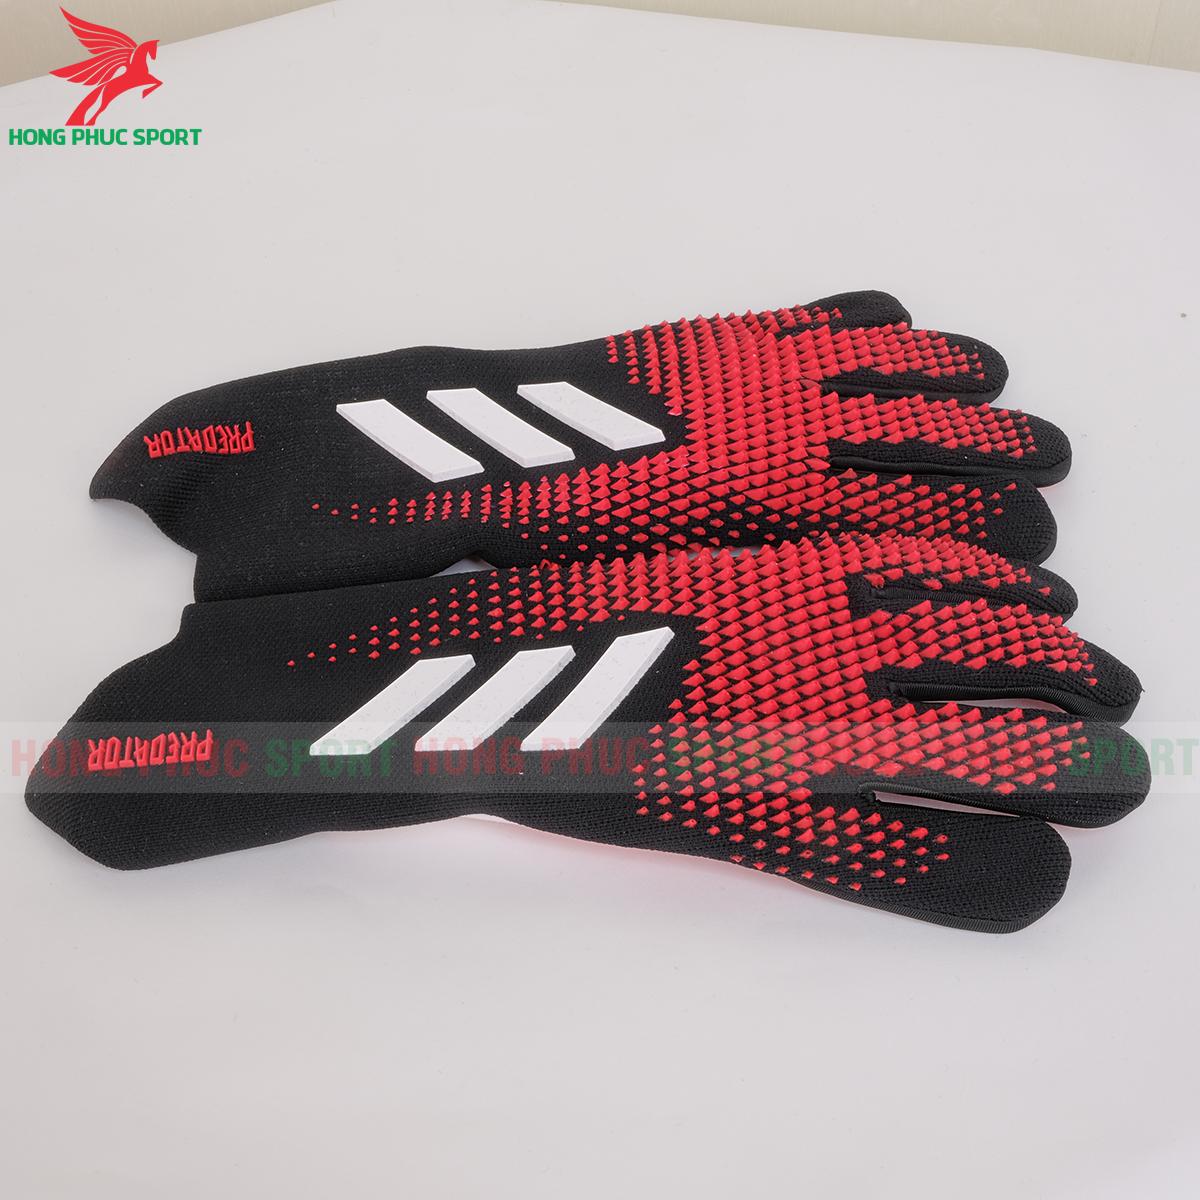 https://cdn.hongphucsport.com/unsafe/s4.shopbay.vn/files/285/gang-tay-thu-mon-adidas-predator-gl-mutator-urg-20-mau-3-1-5f7c466b468b0.png